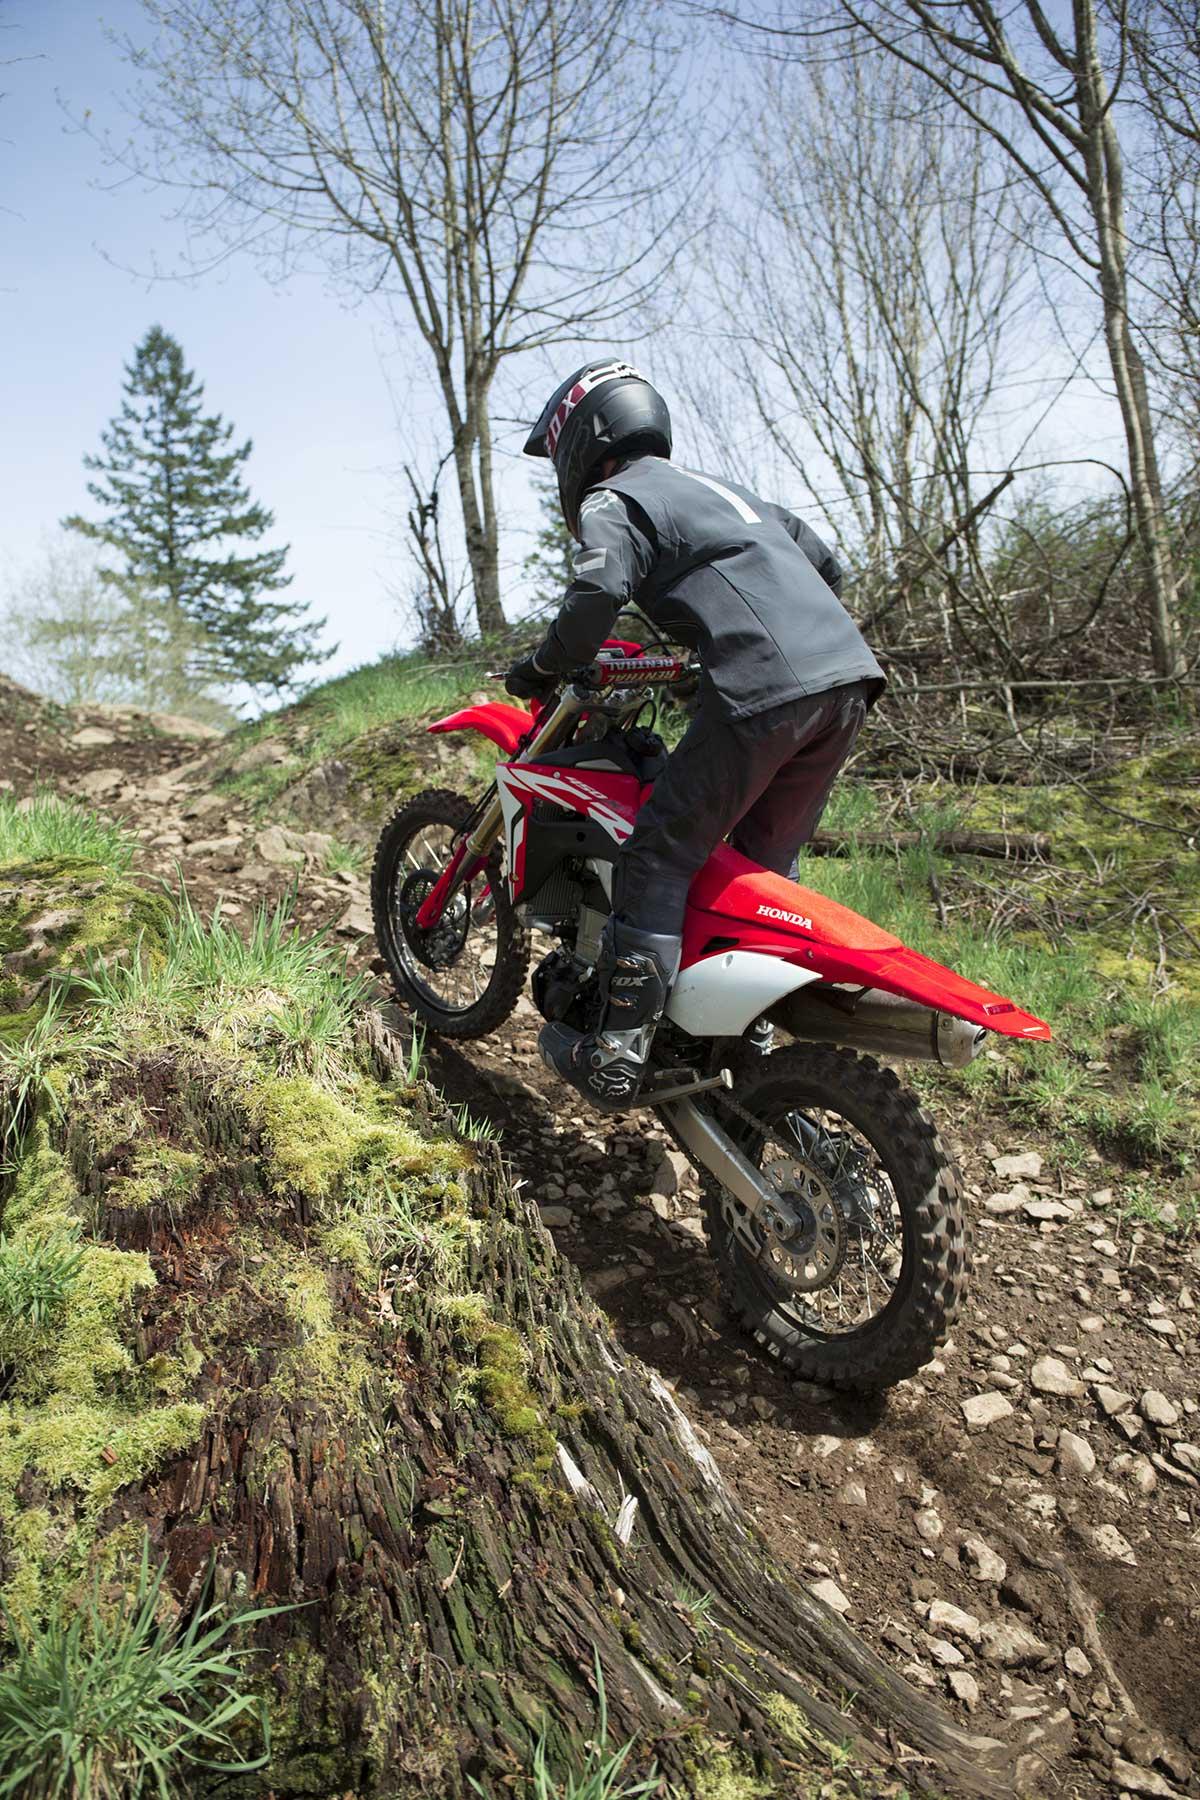 19-Honda-CRF450X_Action_3.jpg